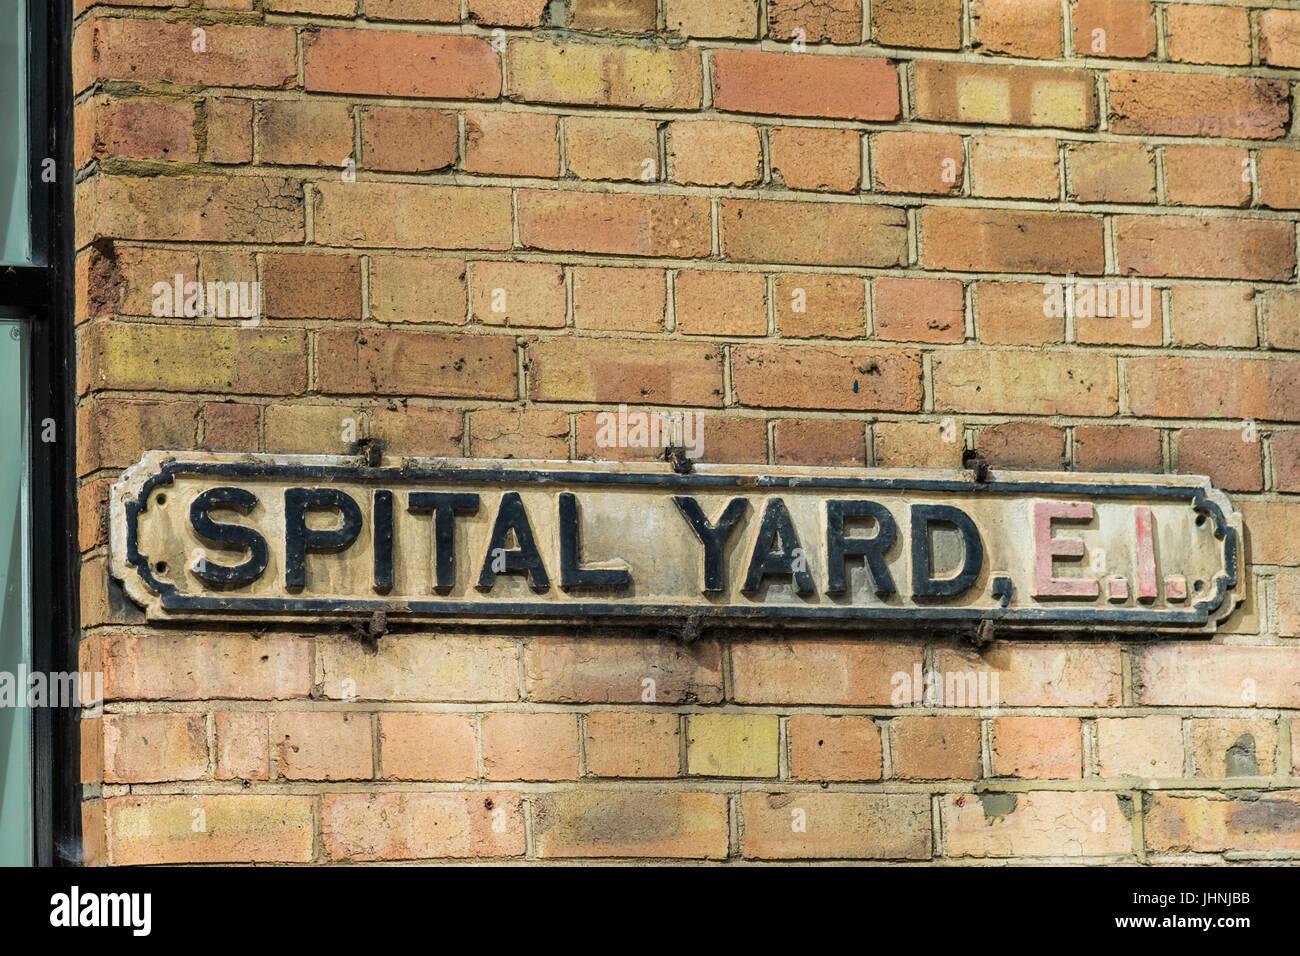 Spital Yard street sign, Borough of Tower Hamlets, London, England, U.K. Stock Photo